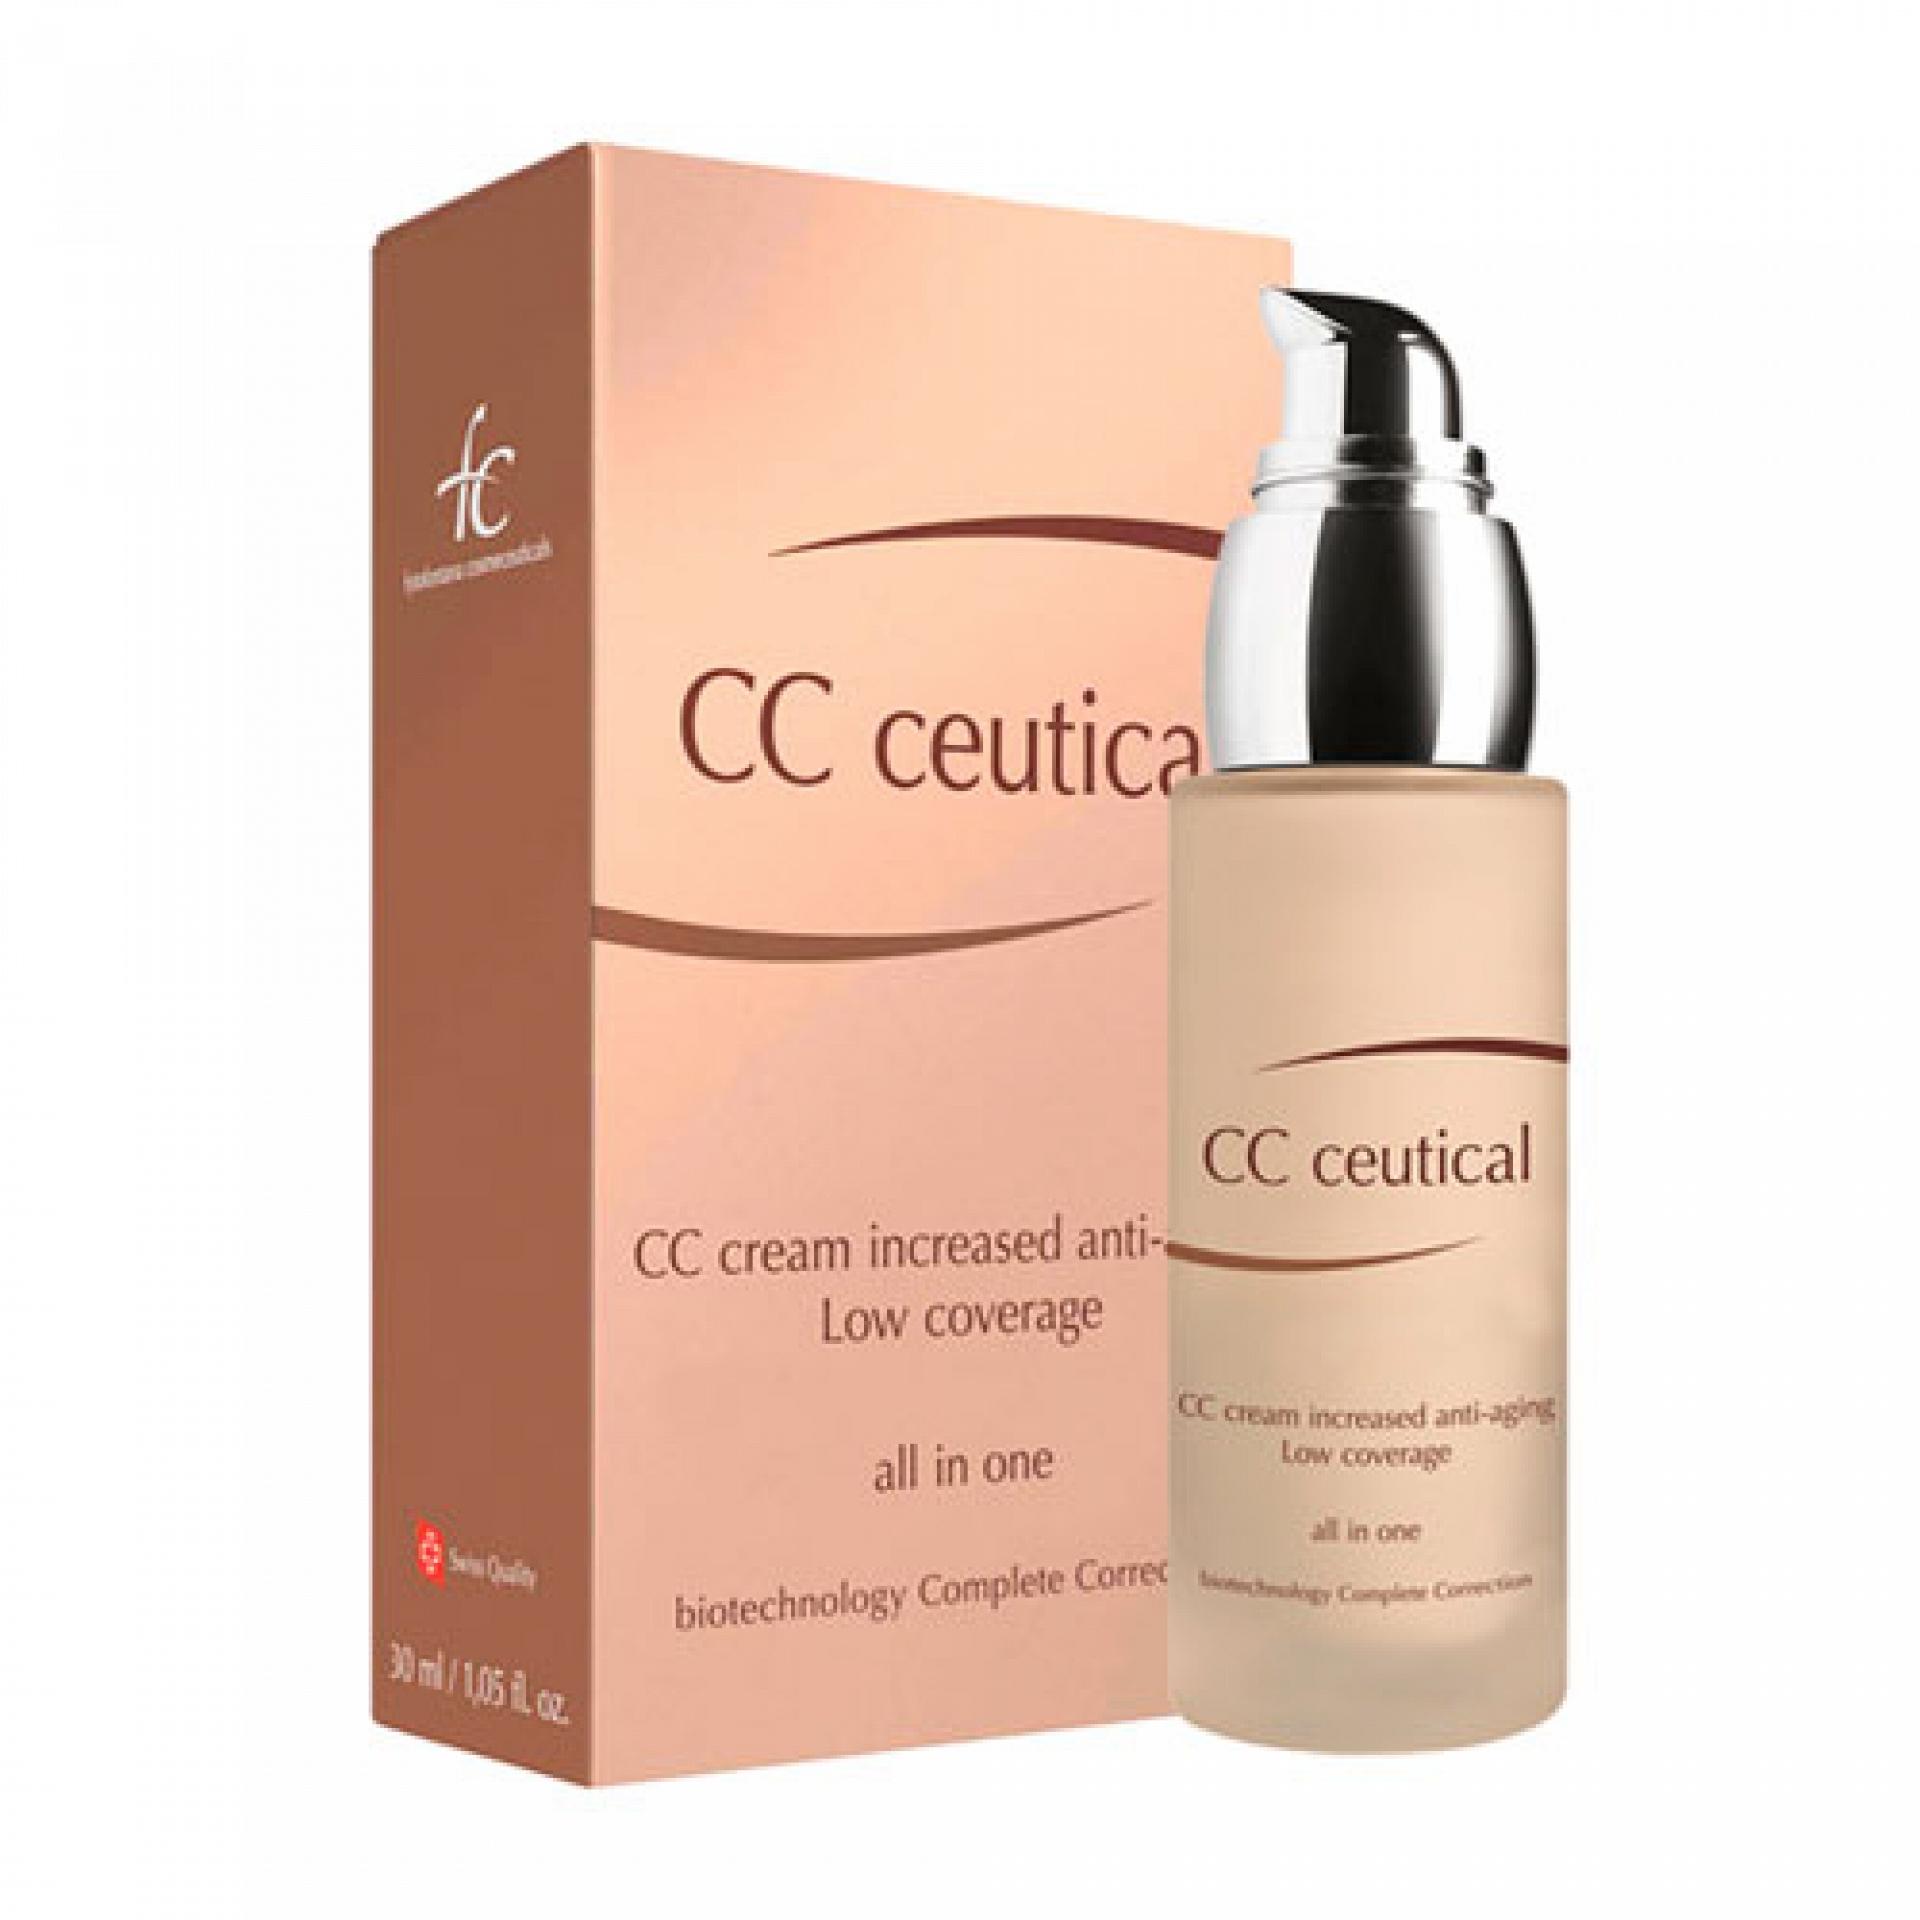 CC Ceutical Antiedad 30ml Fytofontana Cosmeceuticals®